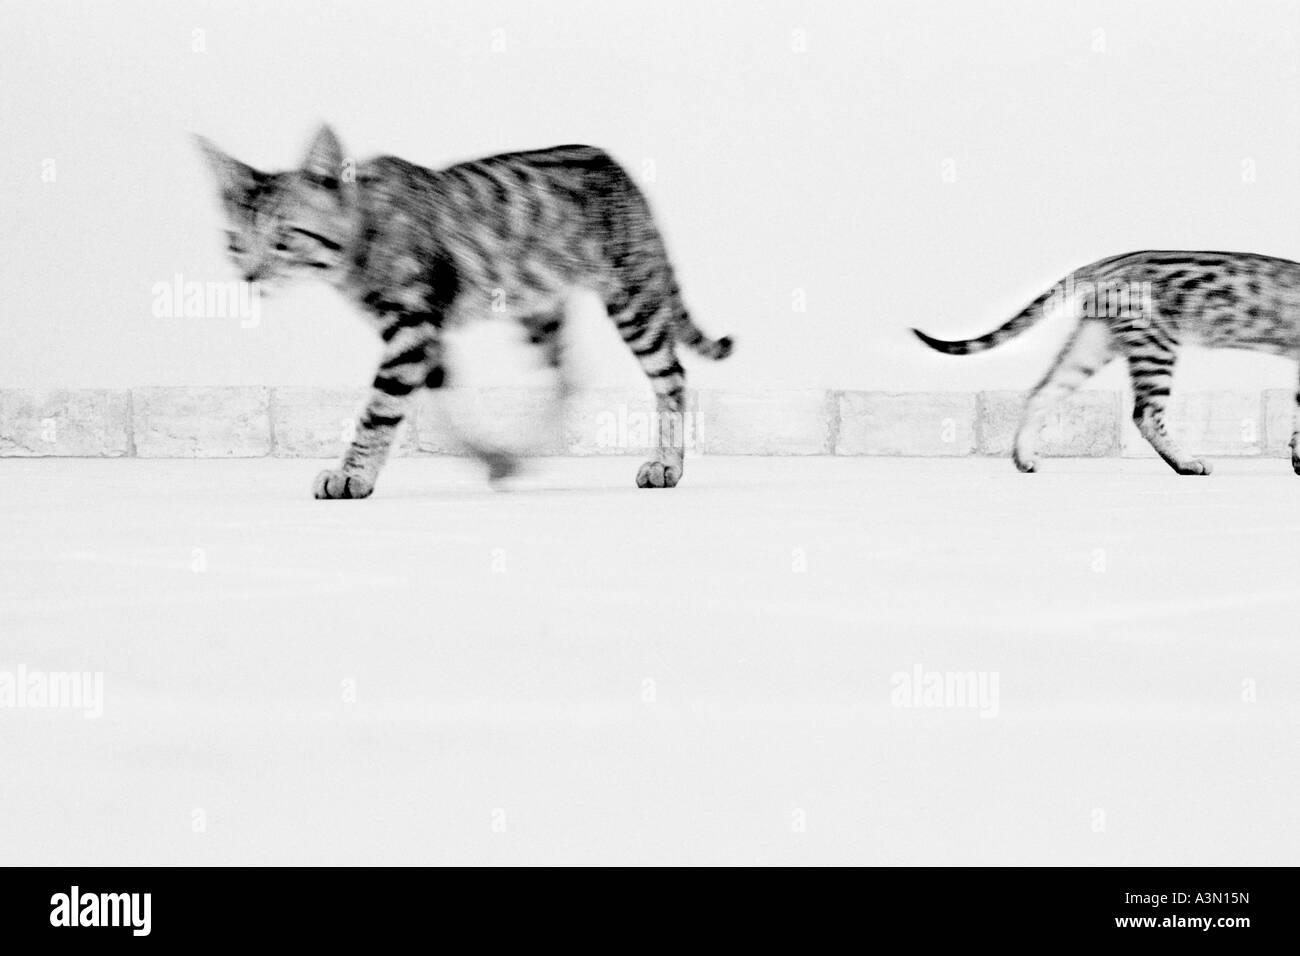 Walking cats - Stock Image